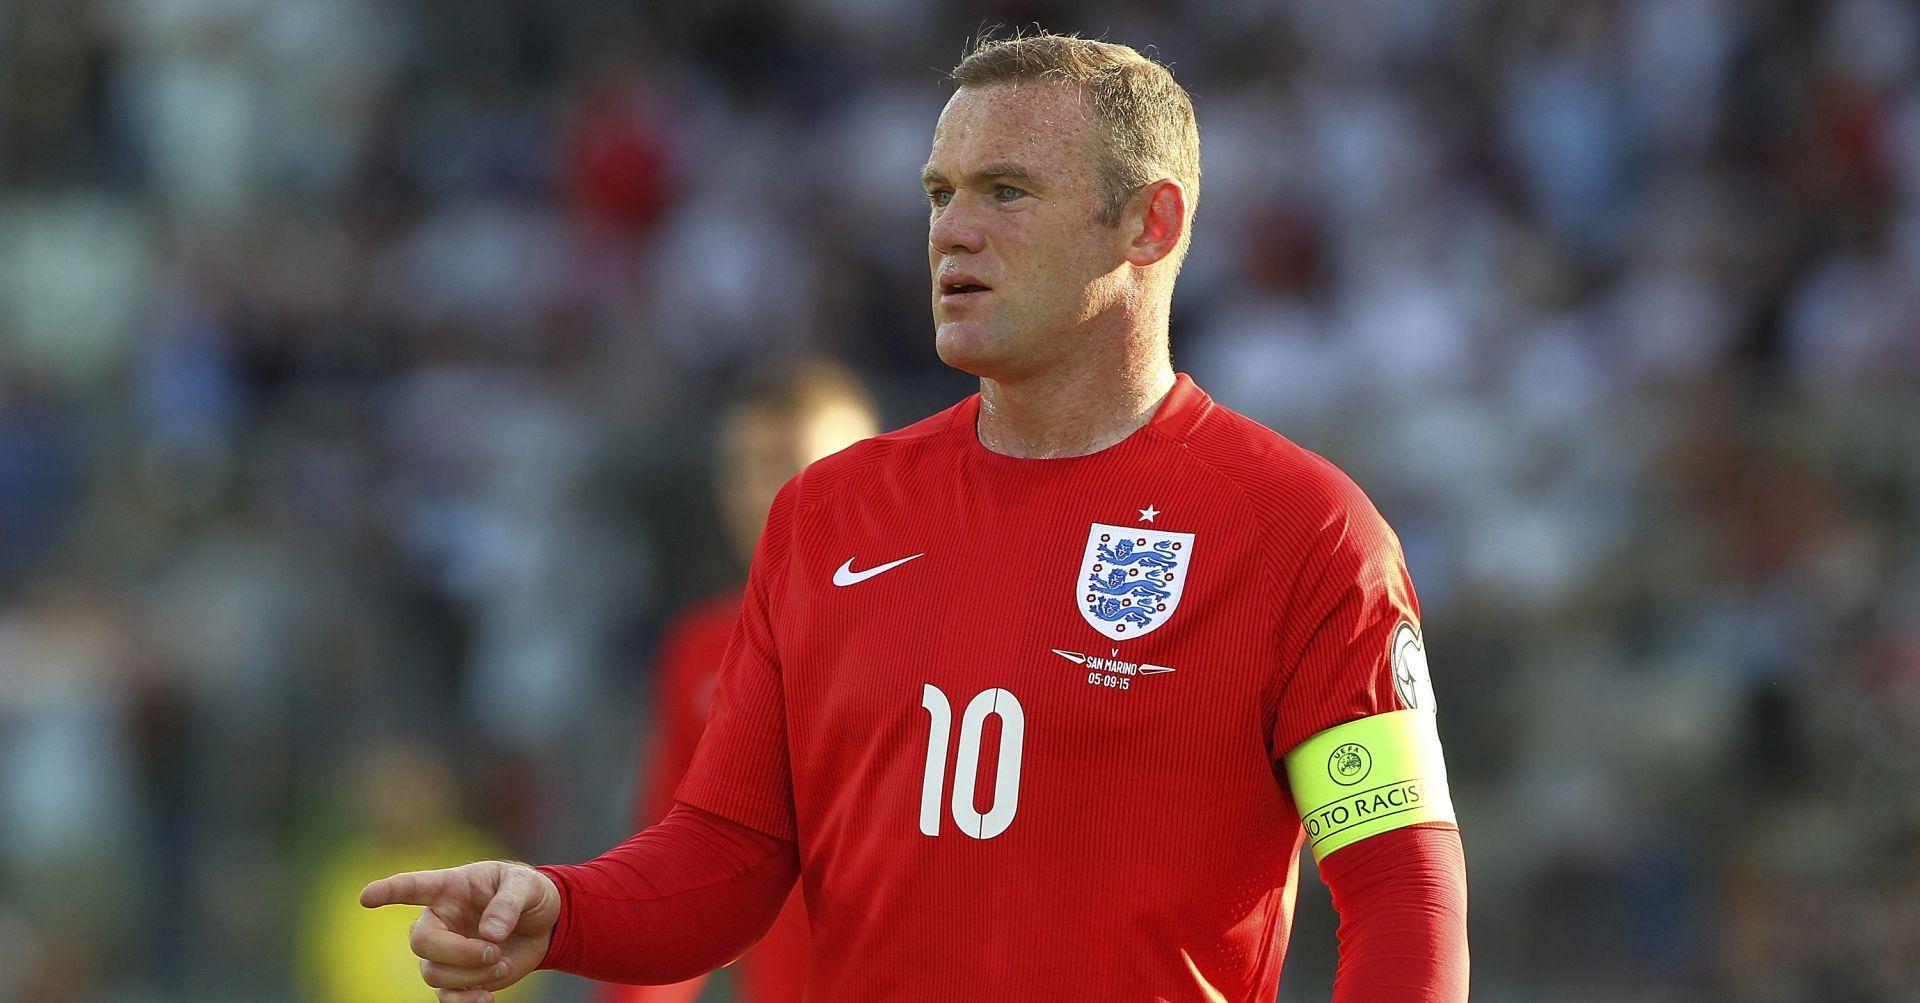 ENGLESKA OSIGIRALA EURO Wayne Rooney izjednačio se s rekordom Sir Bobby Charltona